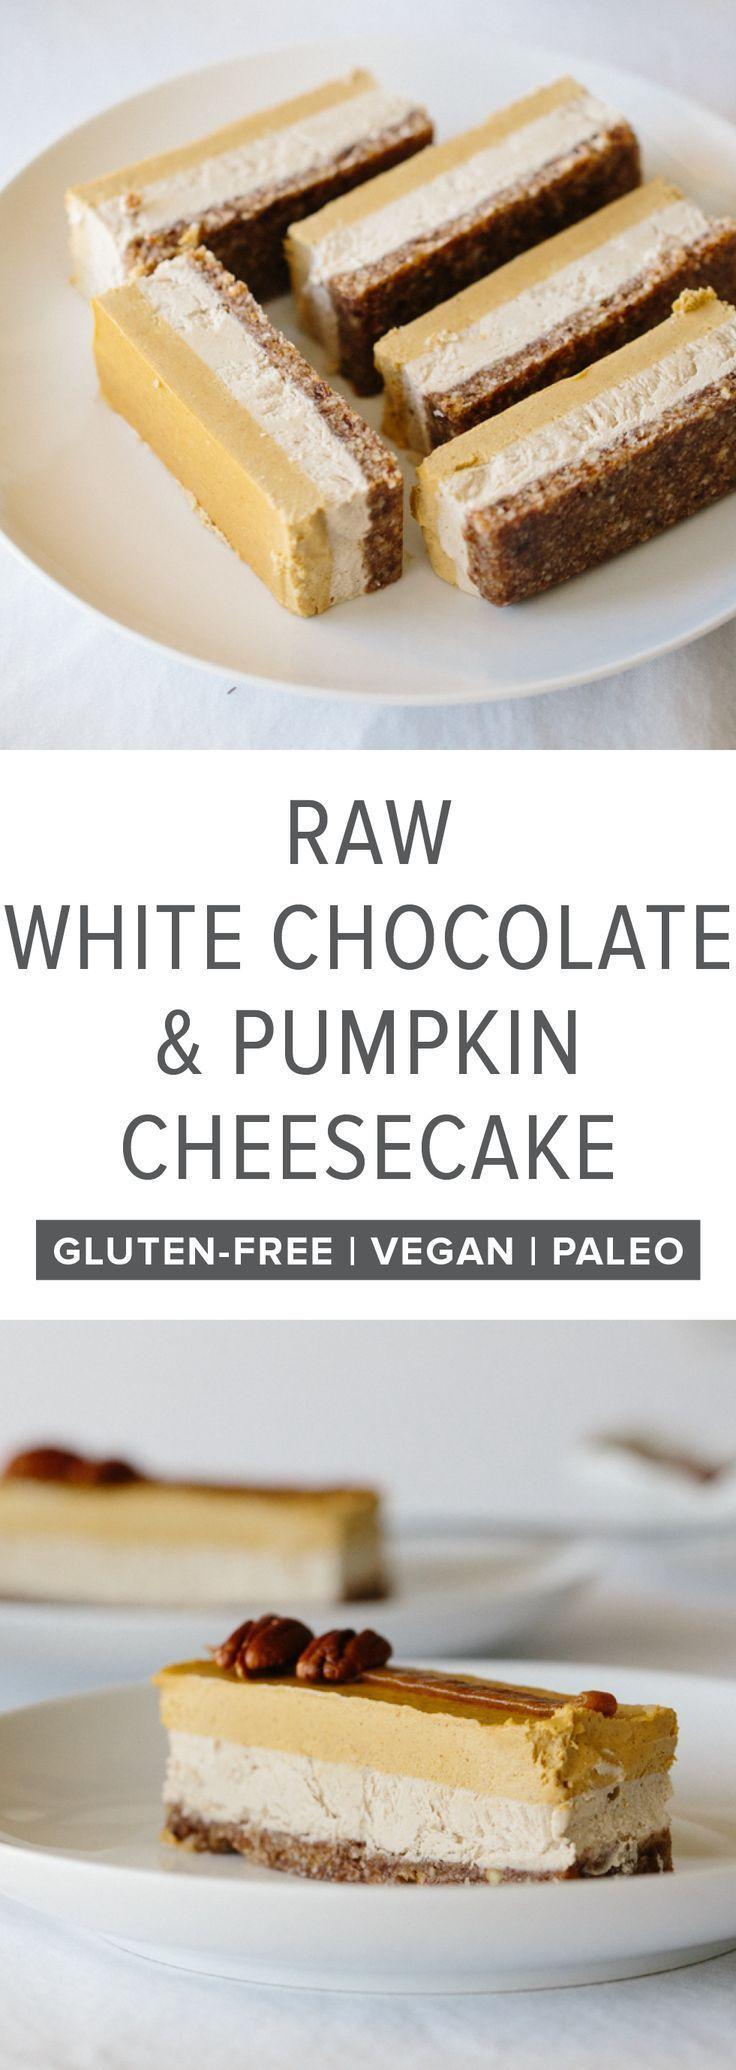 Raw White Chocolate and Pumpkin Cheesecake (gluten-free, vegan, paleo). Raw White Chocolate and Pumpkin Cheesecake - A delicious, seasonal, fall dessert that's a great alternative to pumpkin pie.